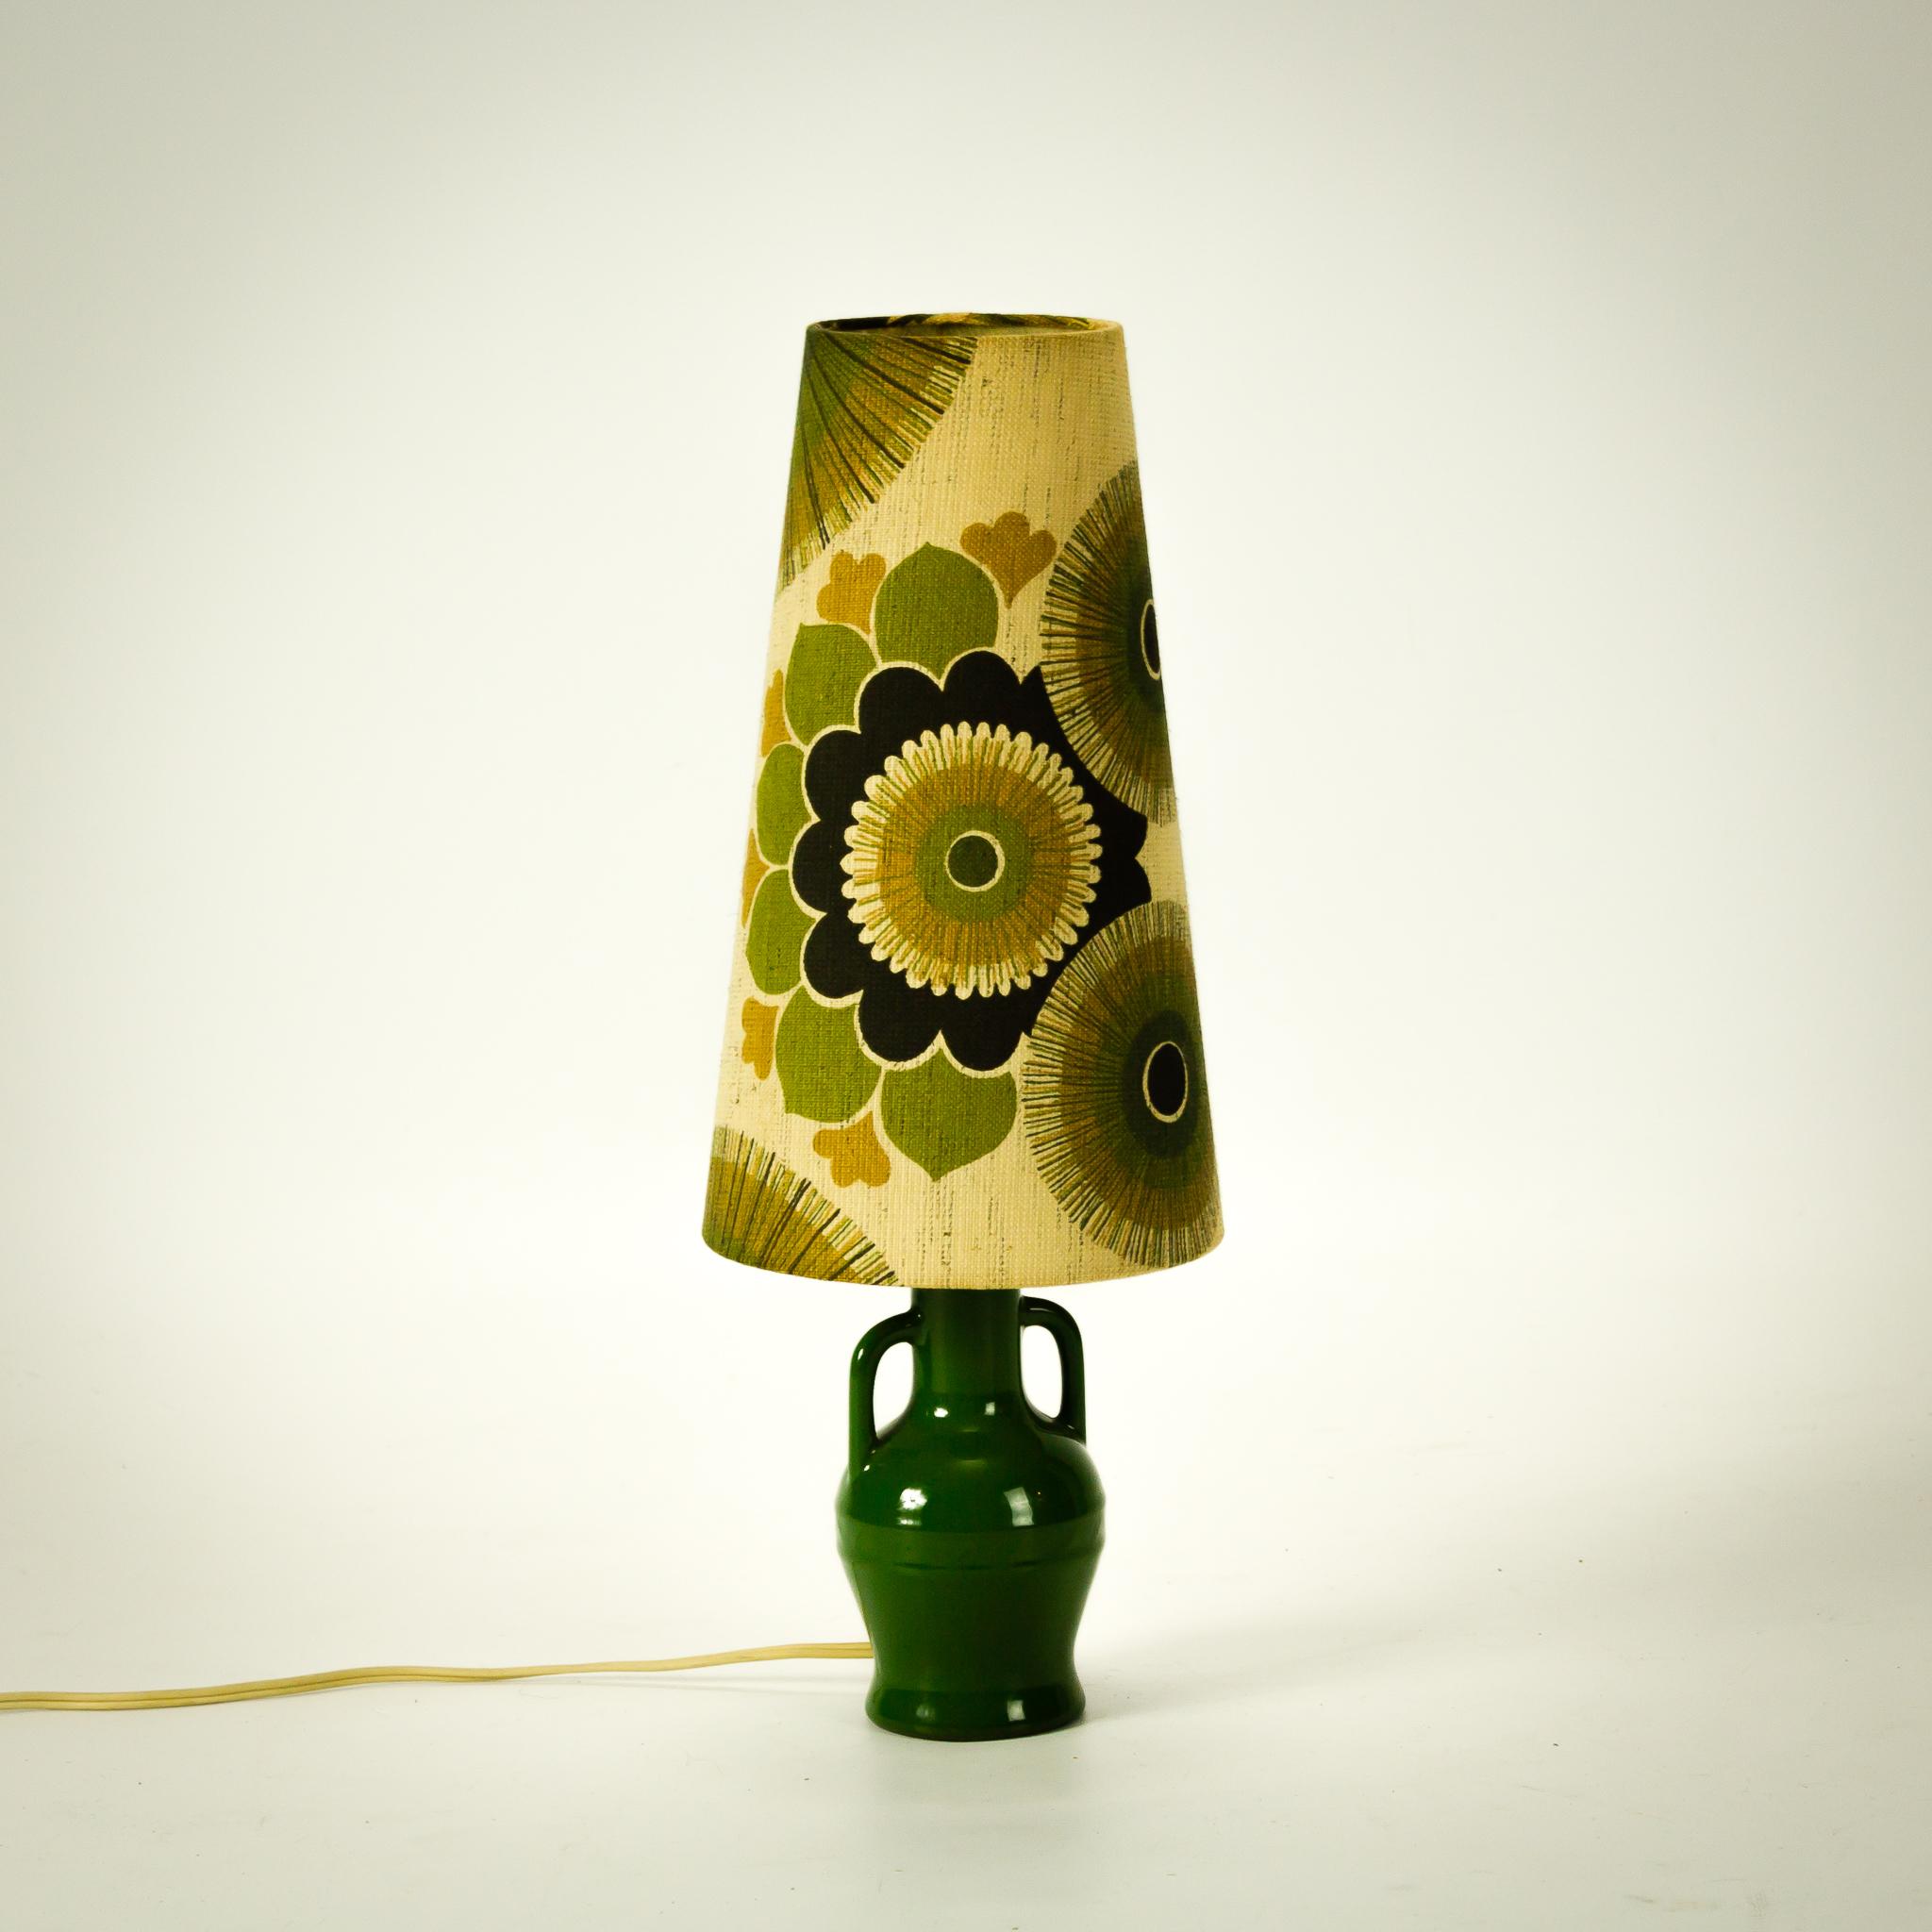 Jaren 70 Retro Groene Tafellamp Keramiek Voet Set2 BarbMama